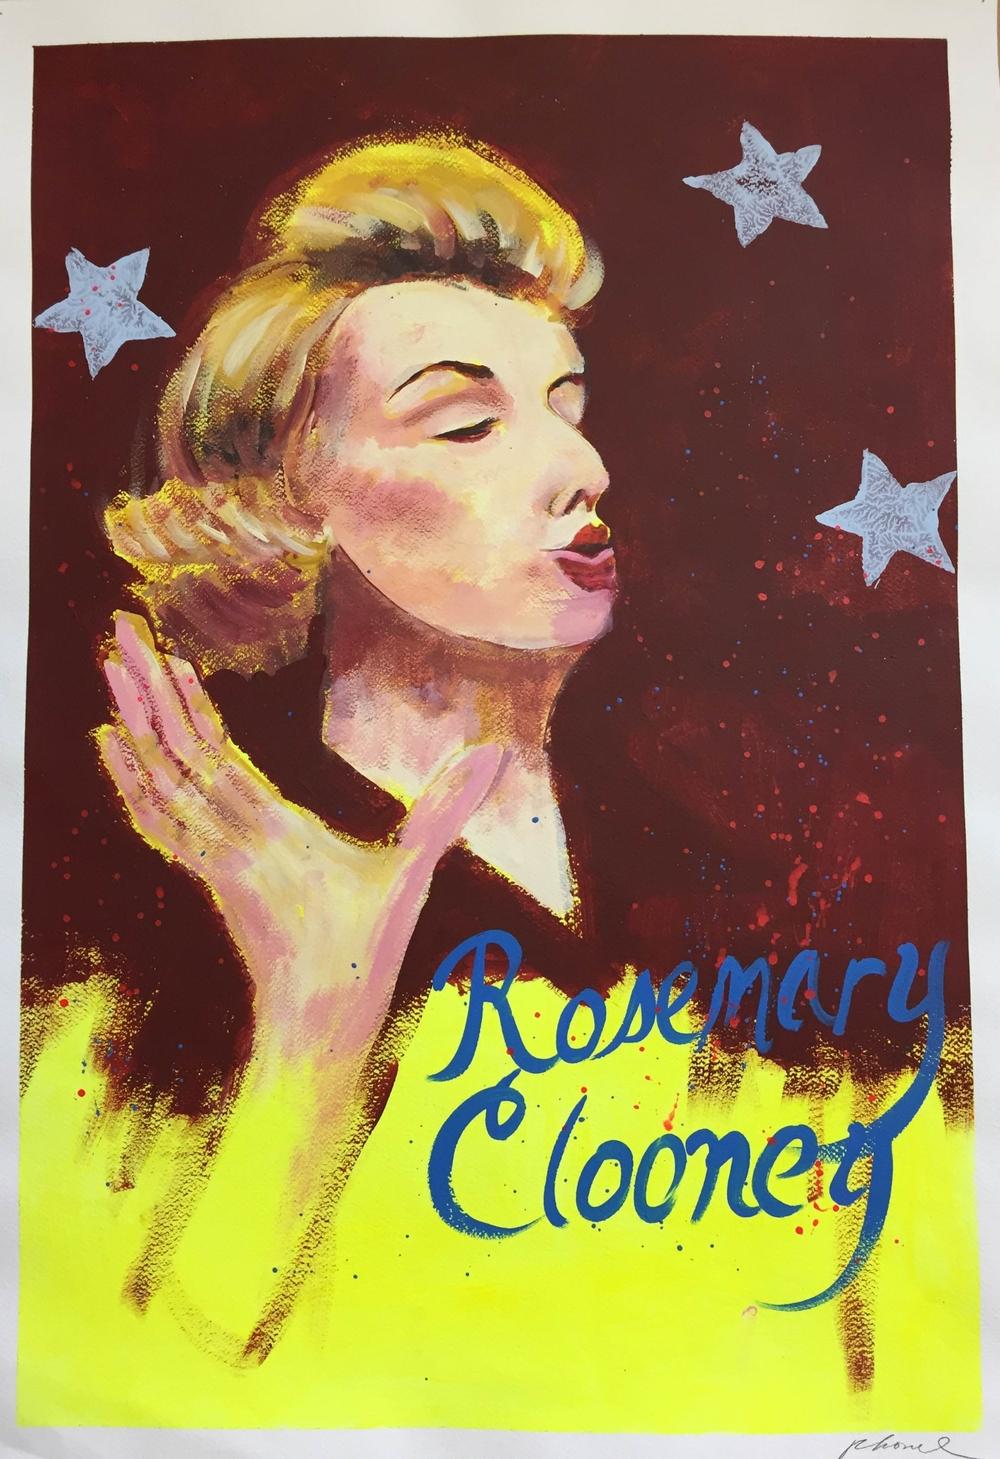 Rosemary Clooney poster (original)